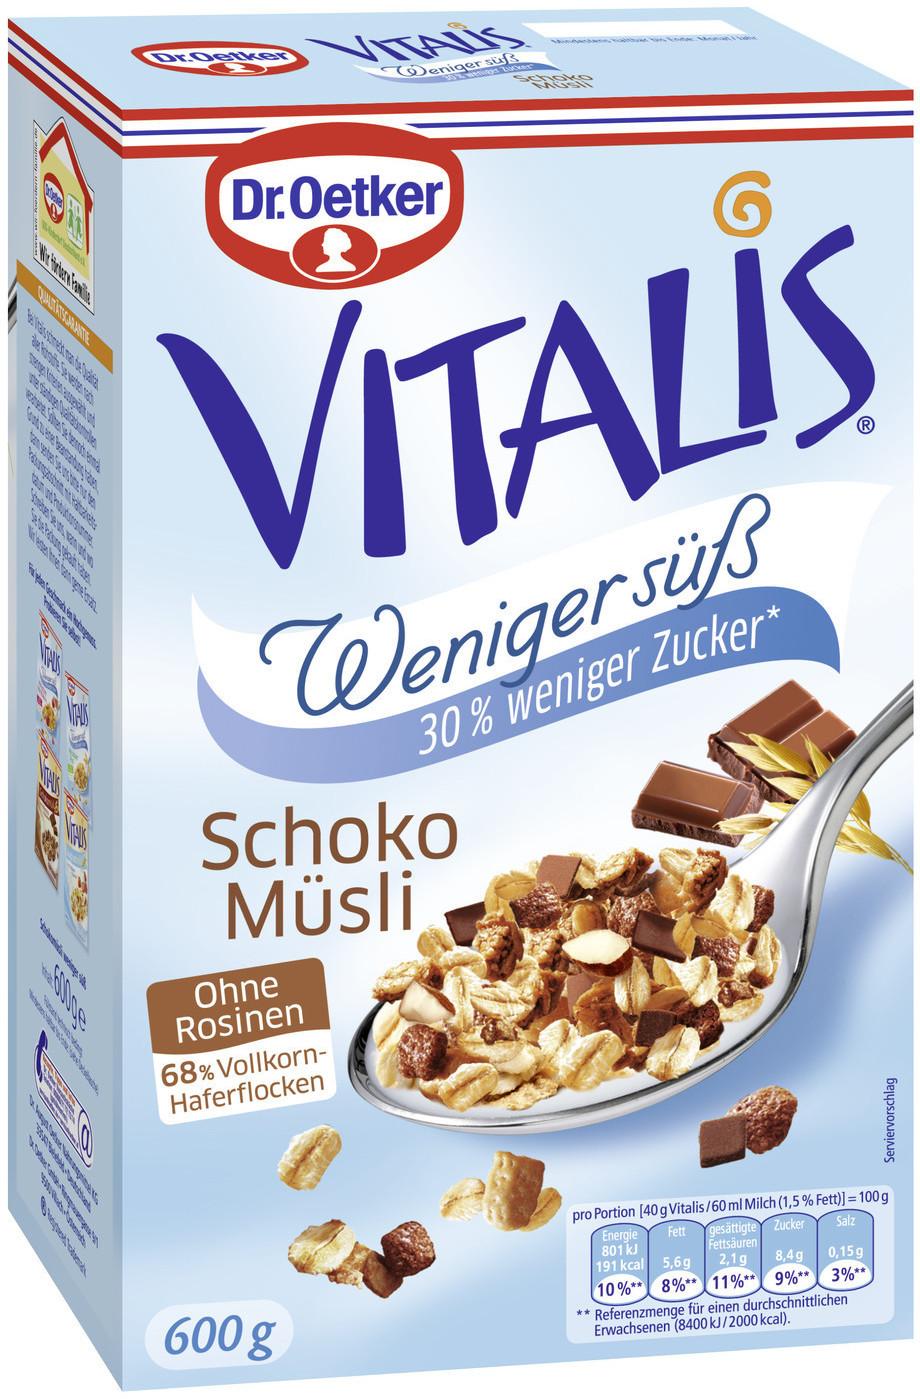 Dr. Oetker Vitalis weniger süß Schoko Müsli (60...